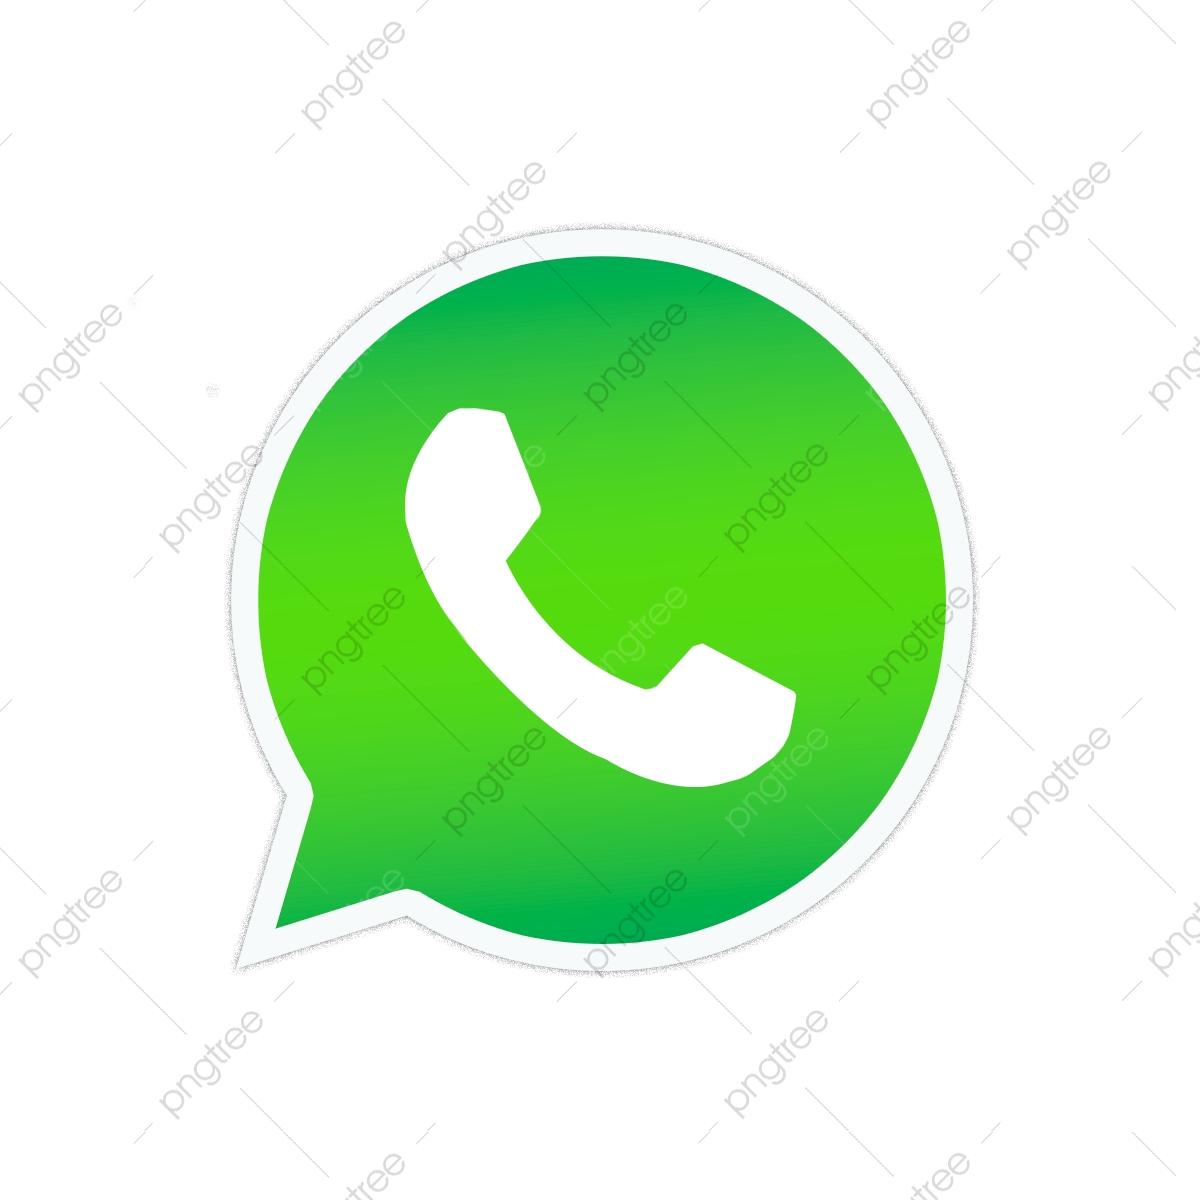 Whatsapp Icon Whatsapp Icon, Whatsapp Icon, Whatsapp Logo, Whatsapp.